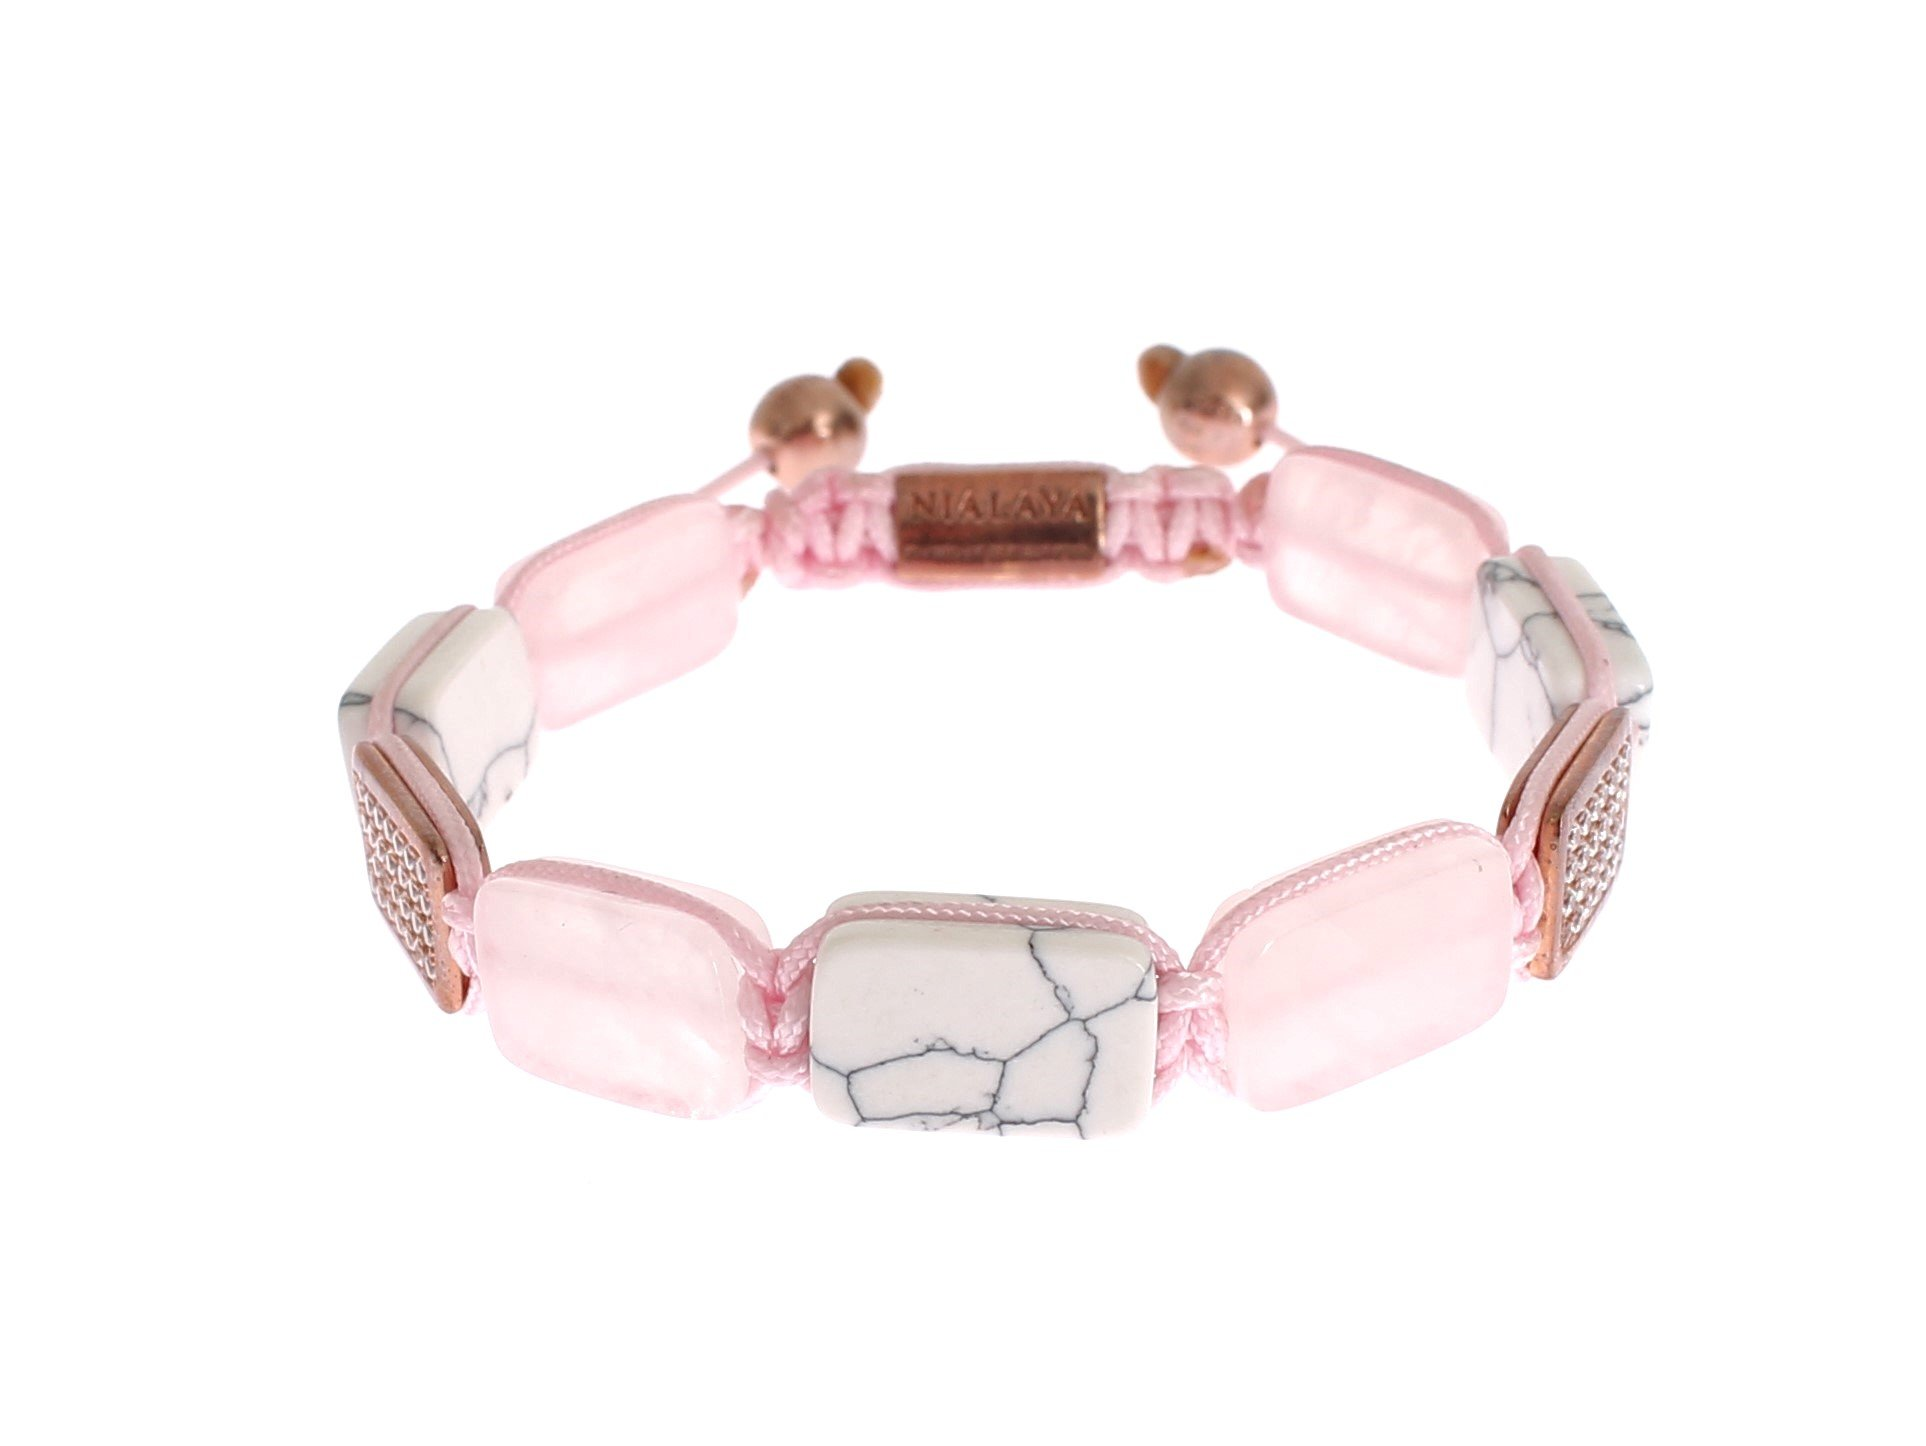 Nialaya Women's CZ Quartz Howlite Rose Gold 925 Bracelet Pink NIA20253 - M